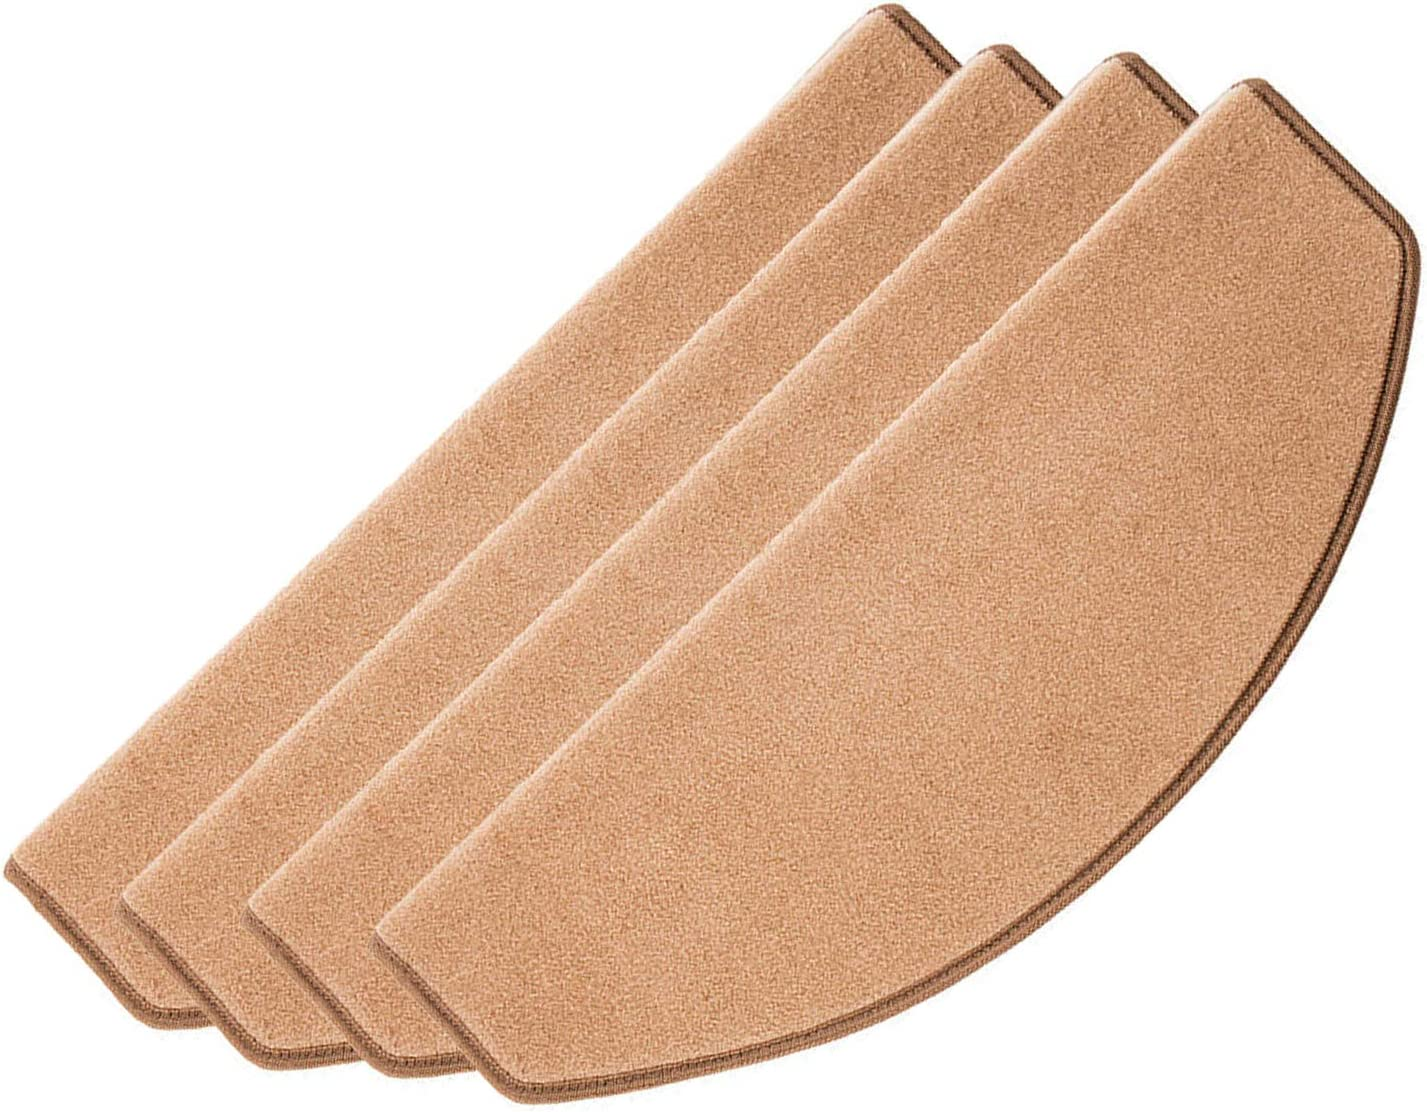 16 Pcs Adhesive Carpet Stair Treads Mats Pad Non-slip Step Protection Rug Grey